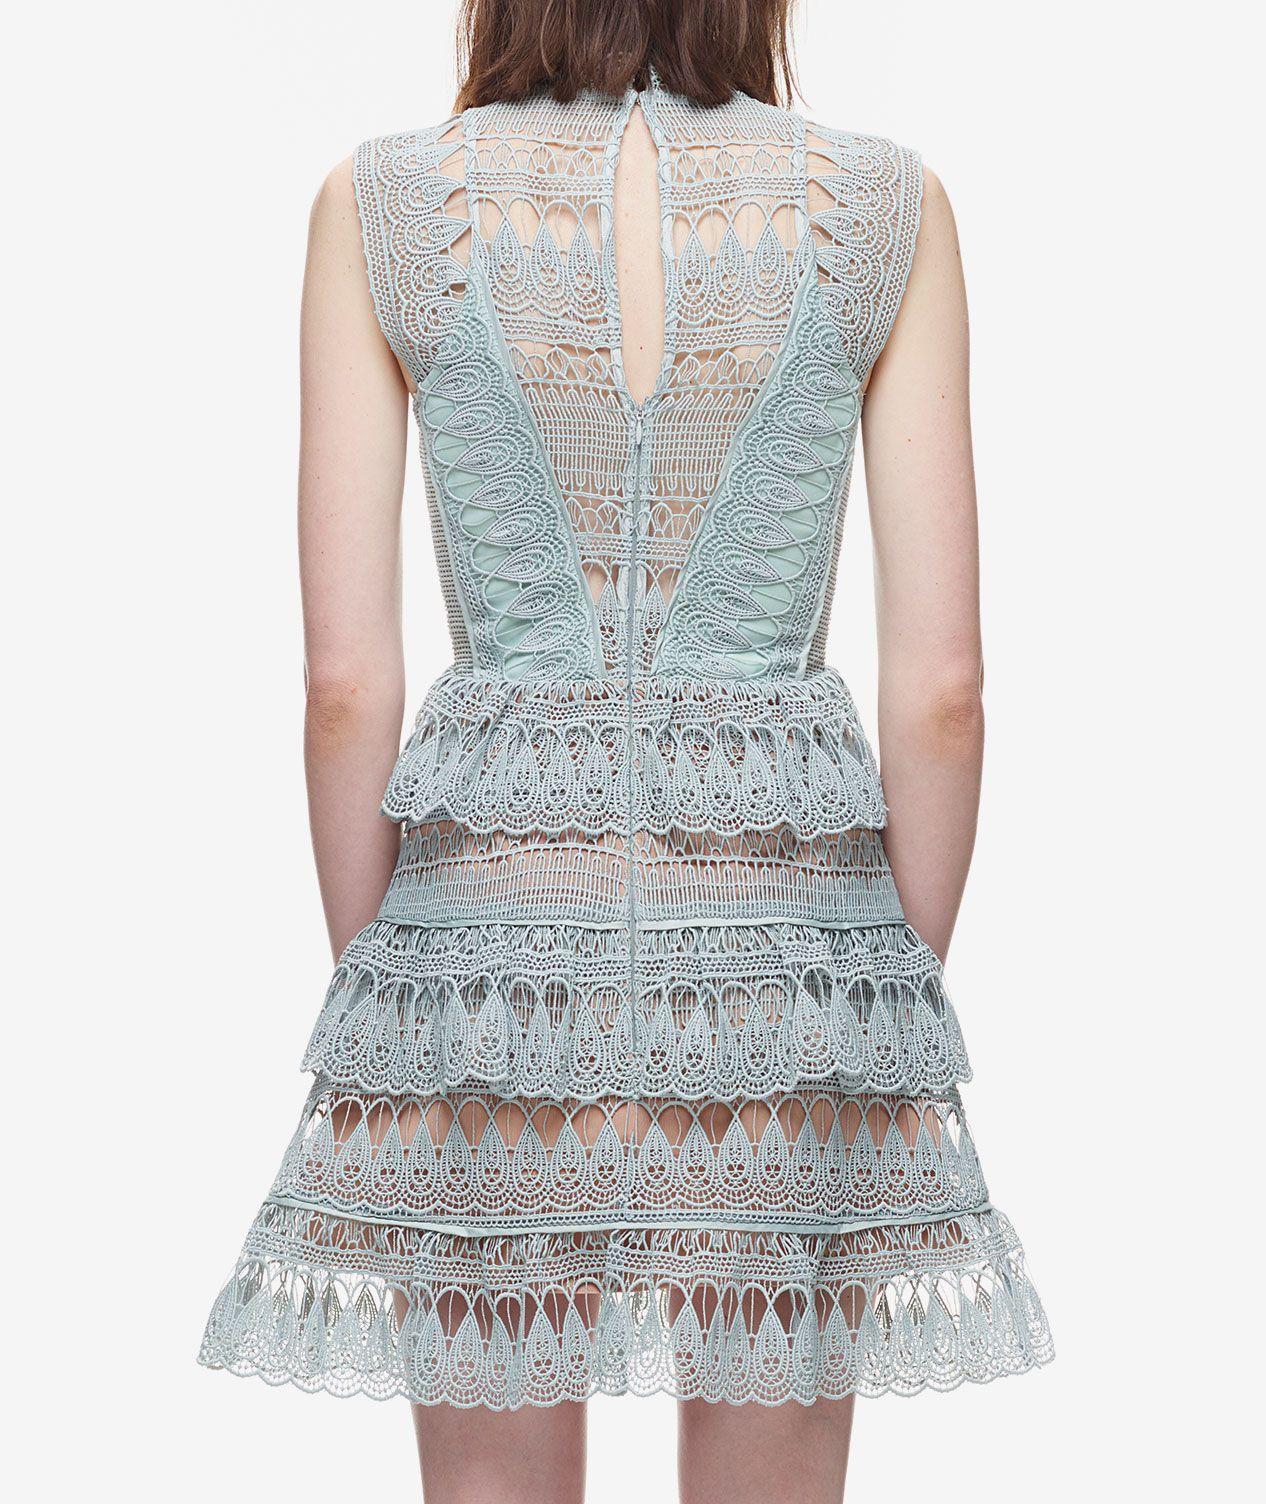 Self Portrait mini dress | Loving it! | Pinterest | Mini dresses ...